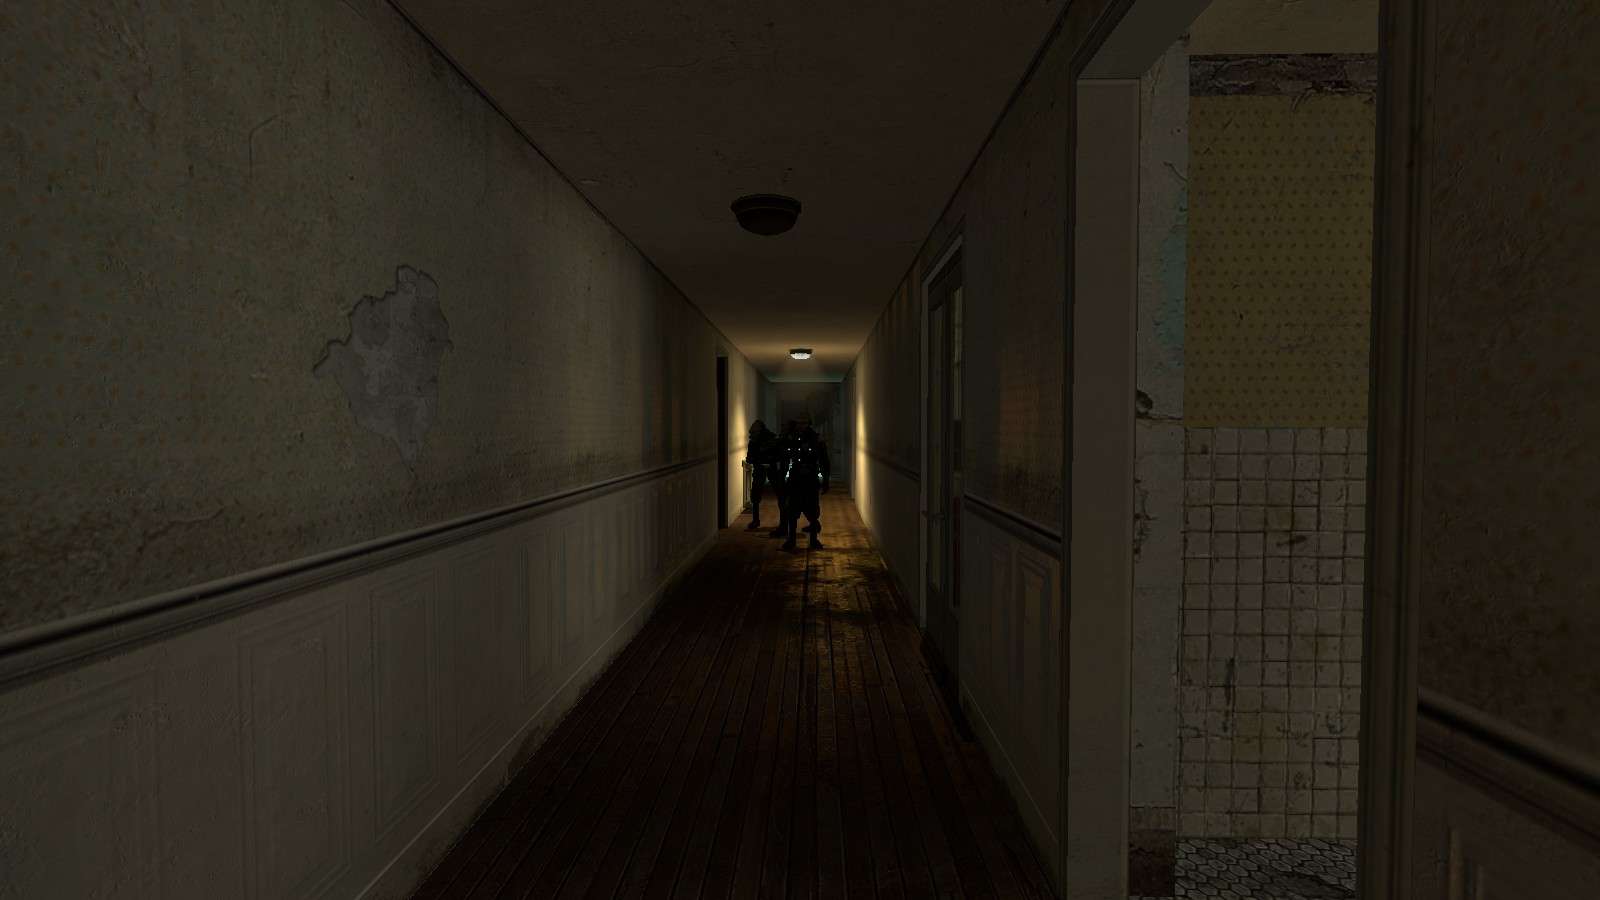 city 17 apt hallway 2